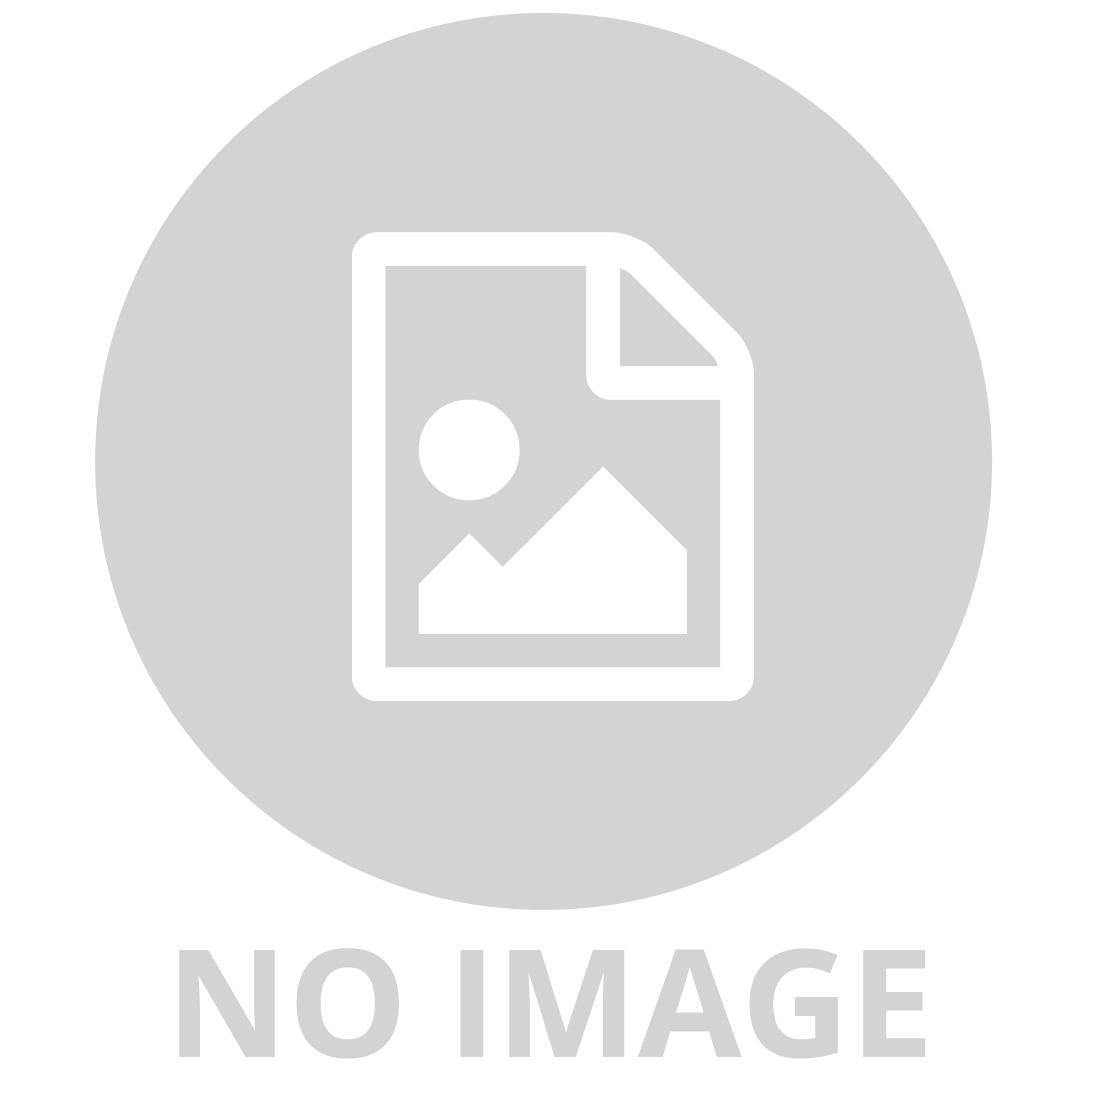 HAMA DOG AND CATS BOX SET- APR 2000 BEADS